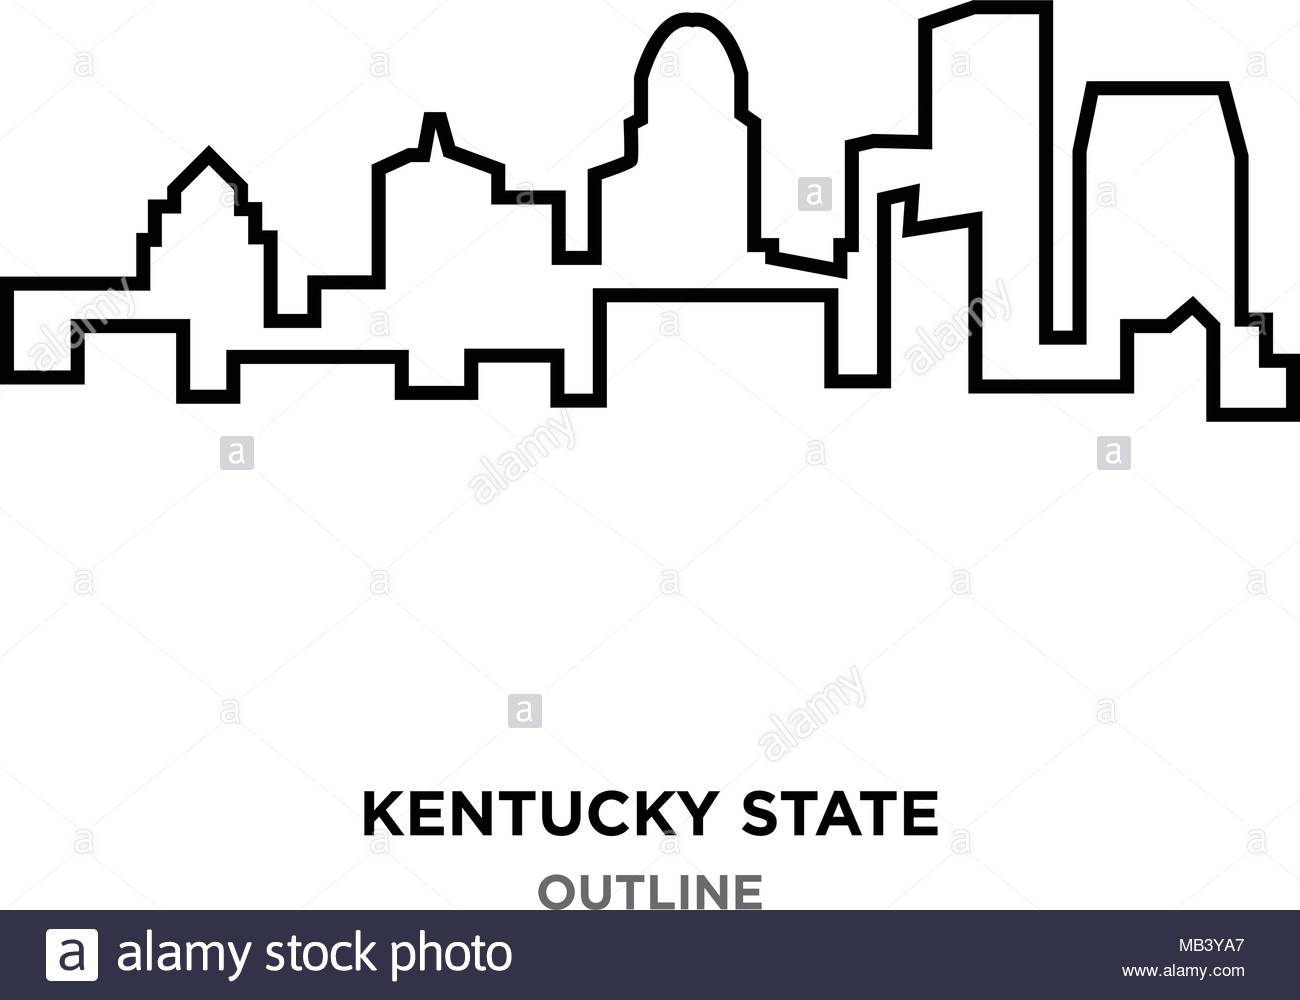 1300x1000 Kentucky State Police Stock Photos Amp Kentucky State Police Stock